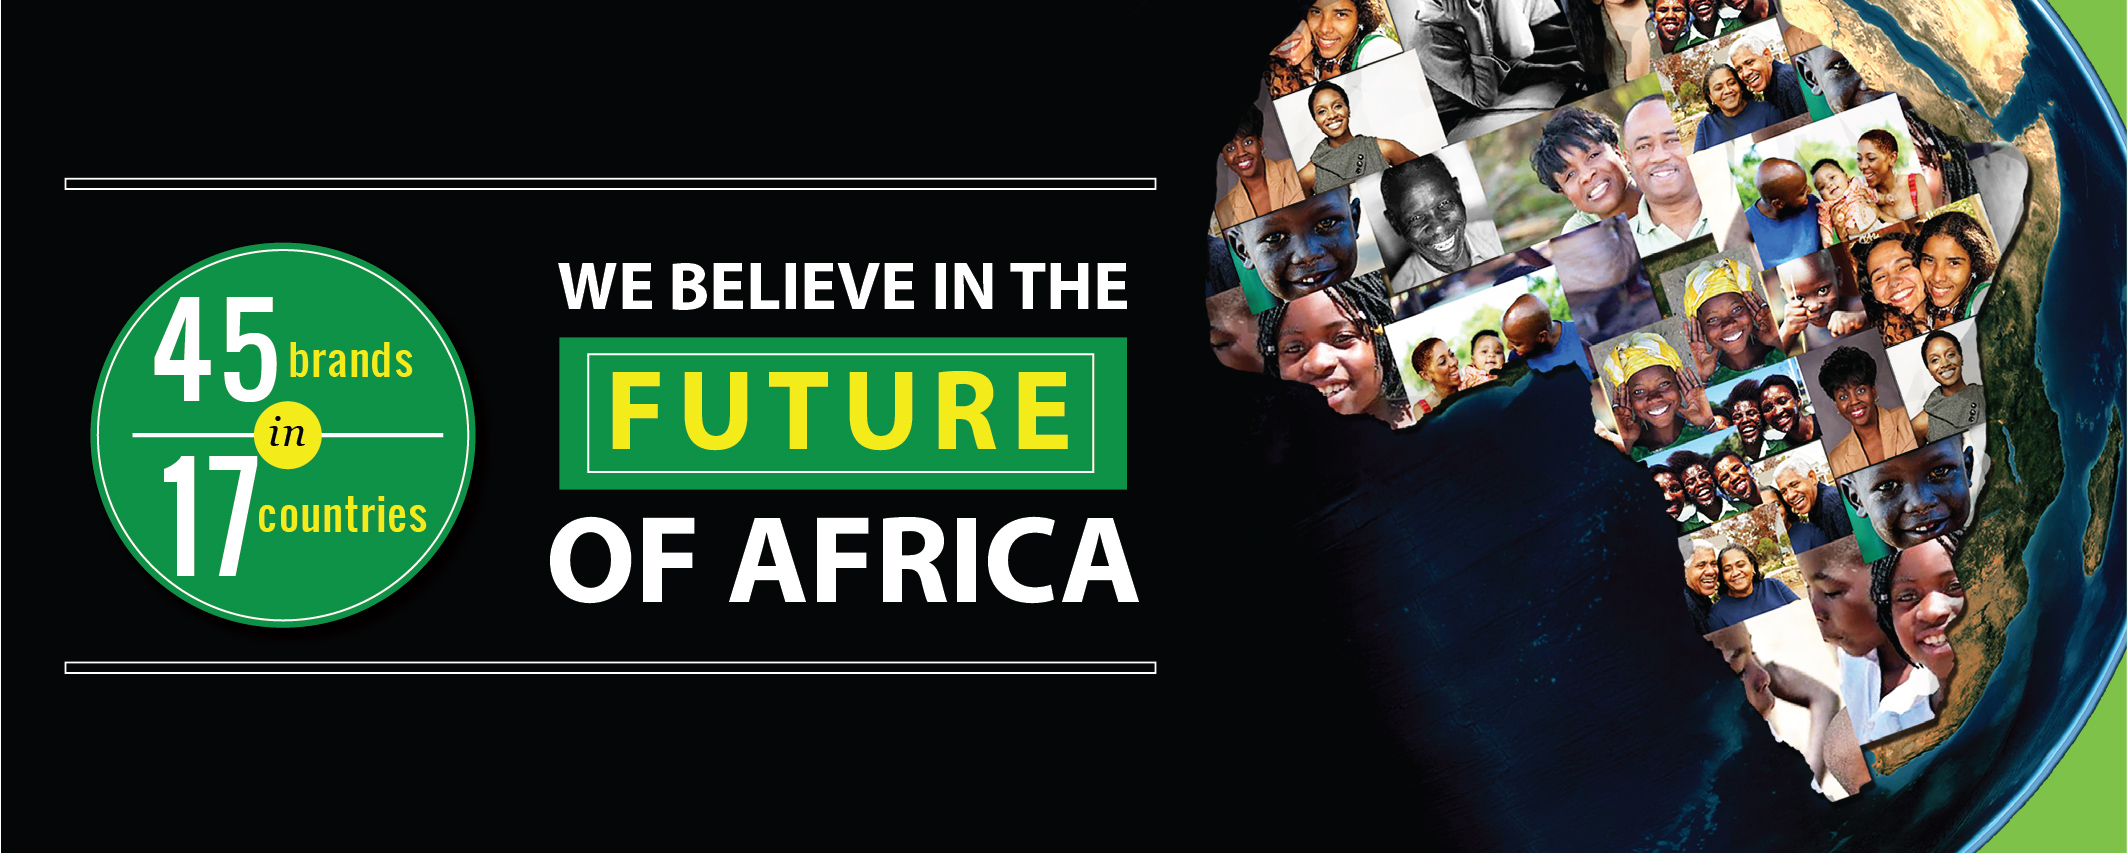 Bidco Africa slider image